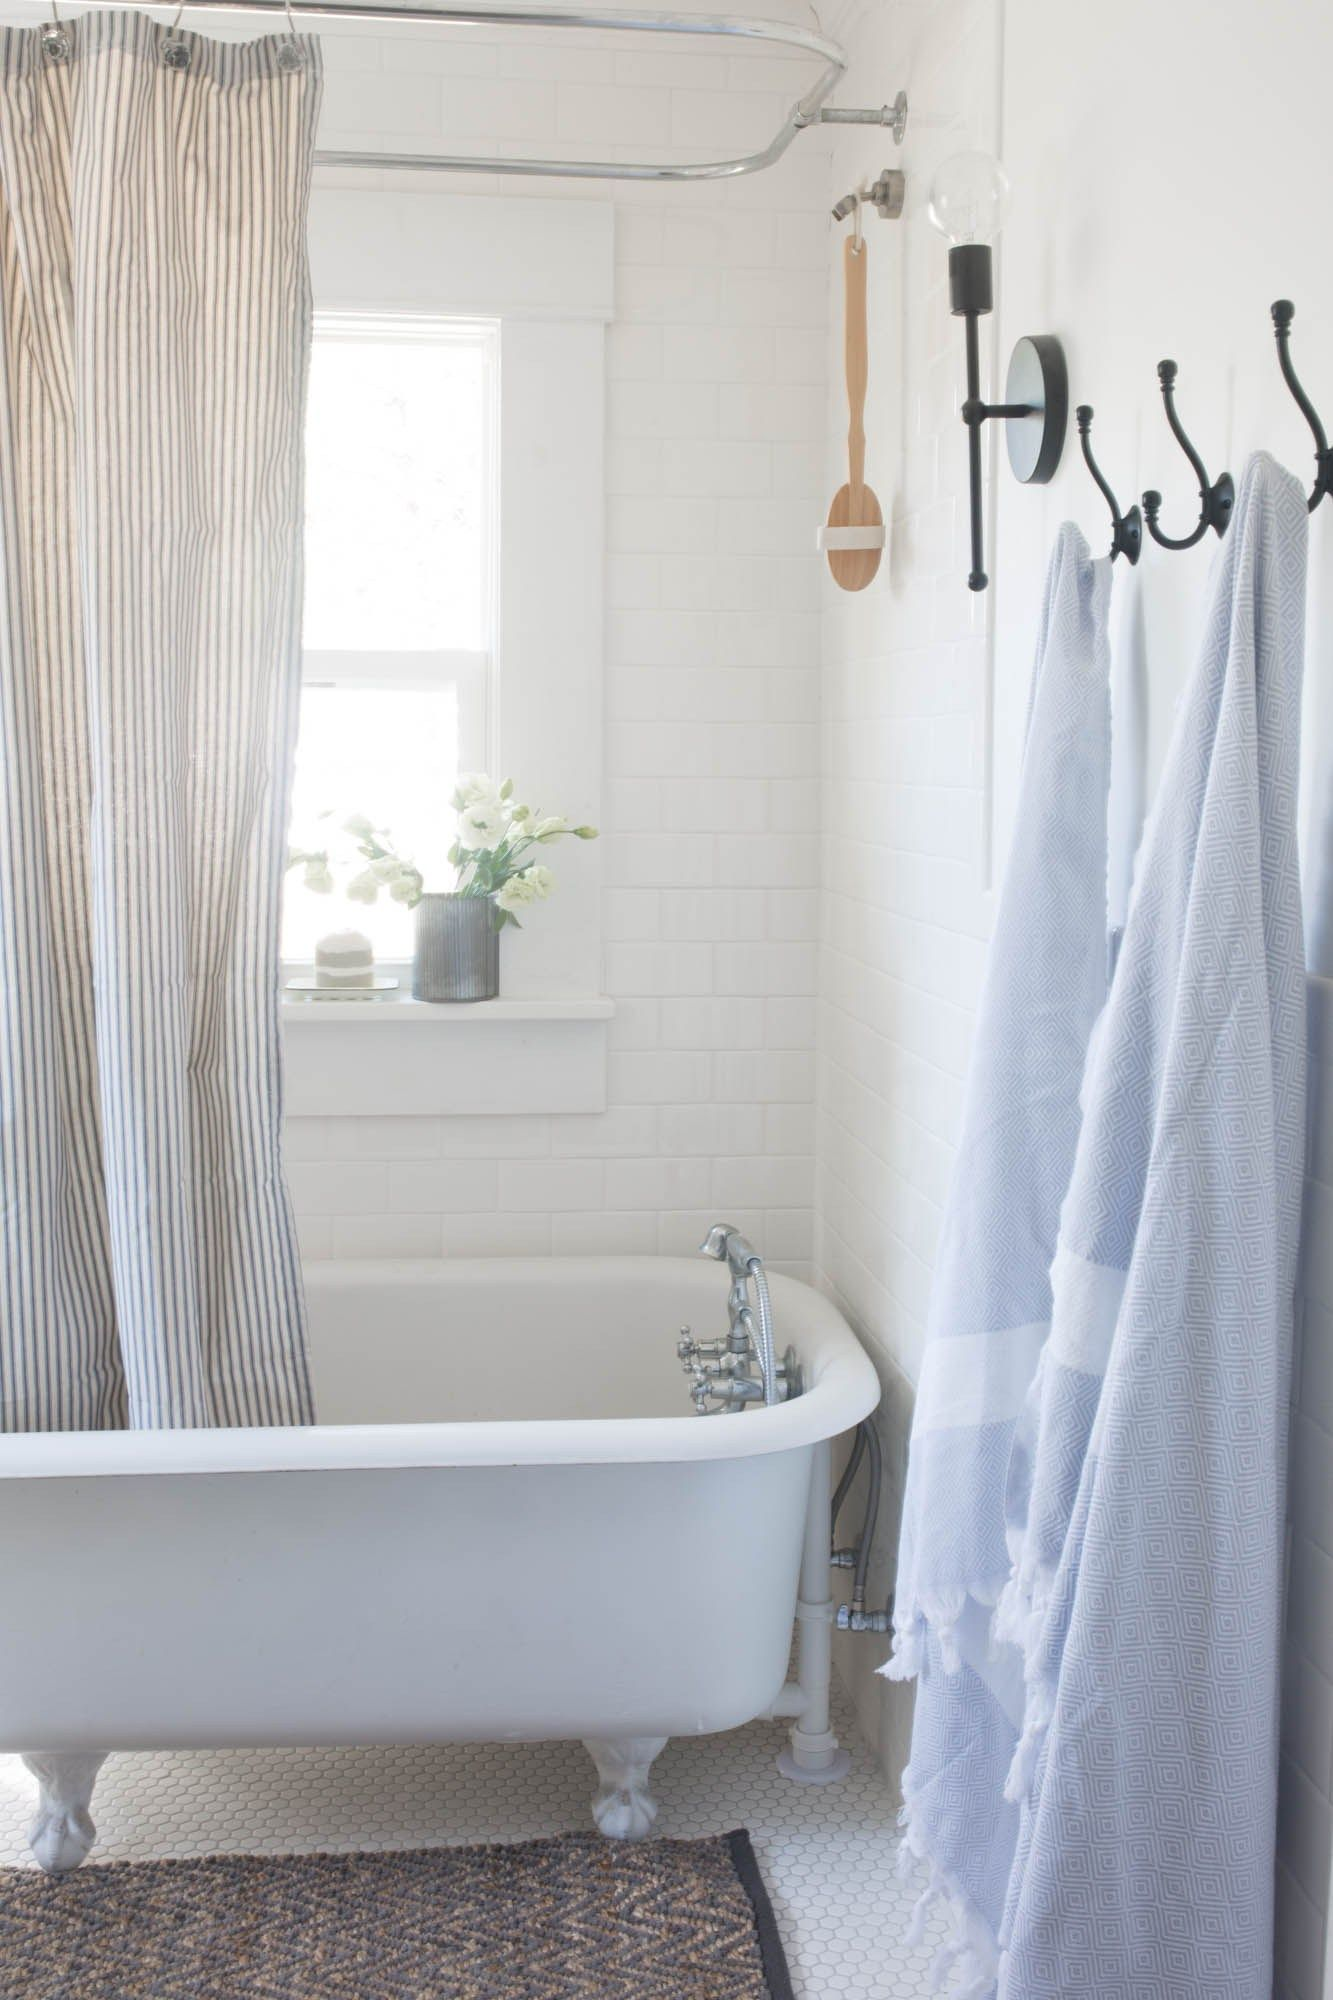 Bathroom window decor  farmhouse bathroom decor  tubs towels and washroom